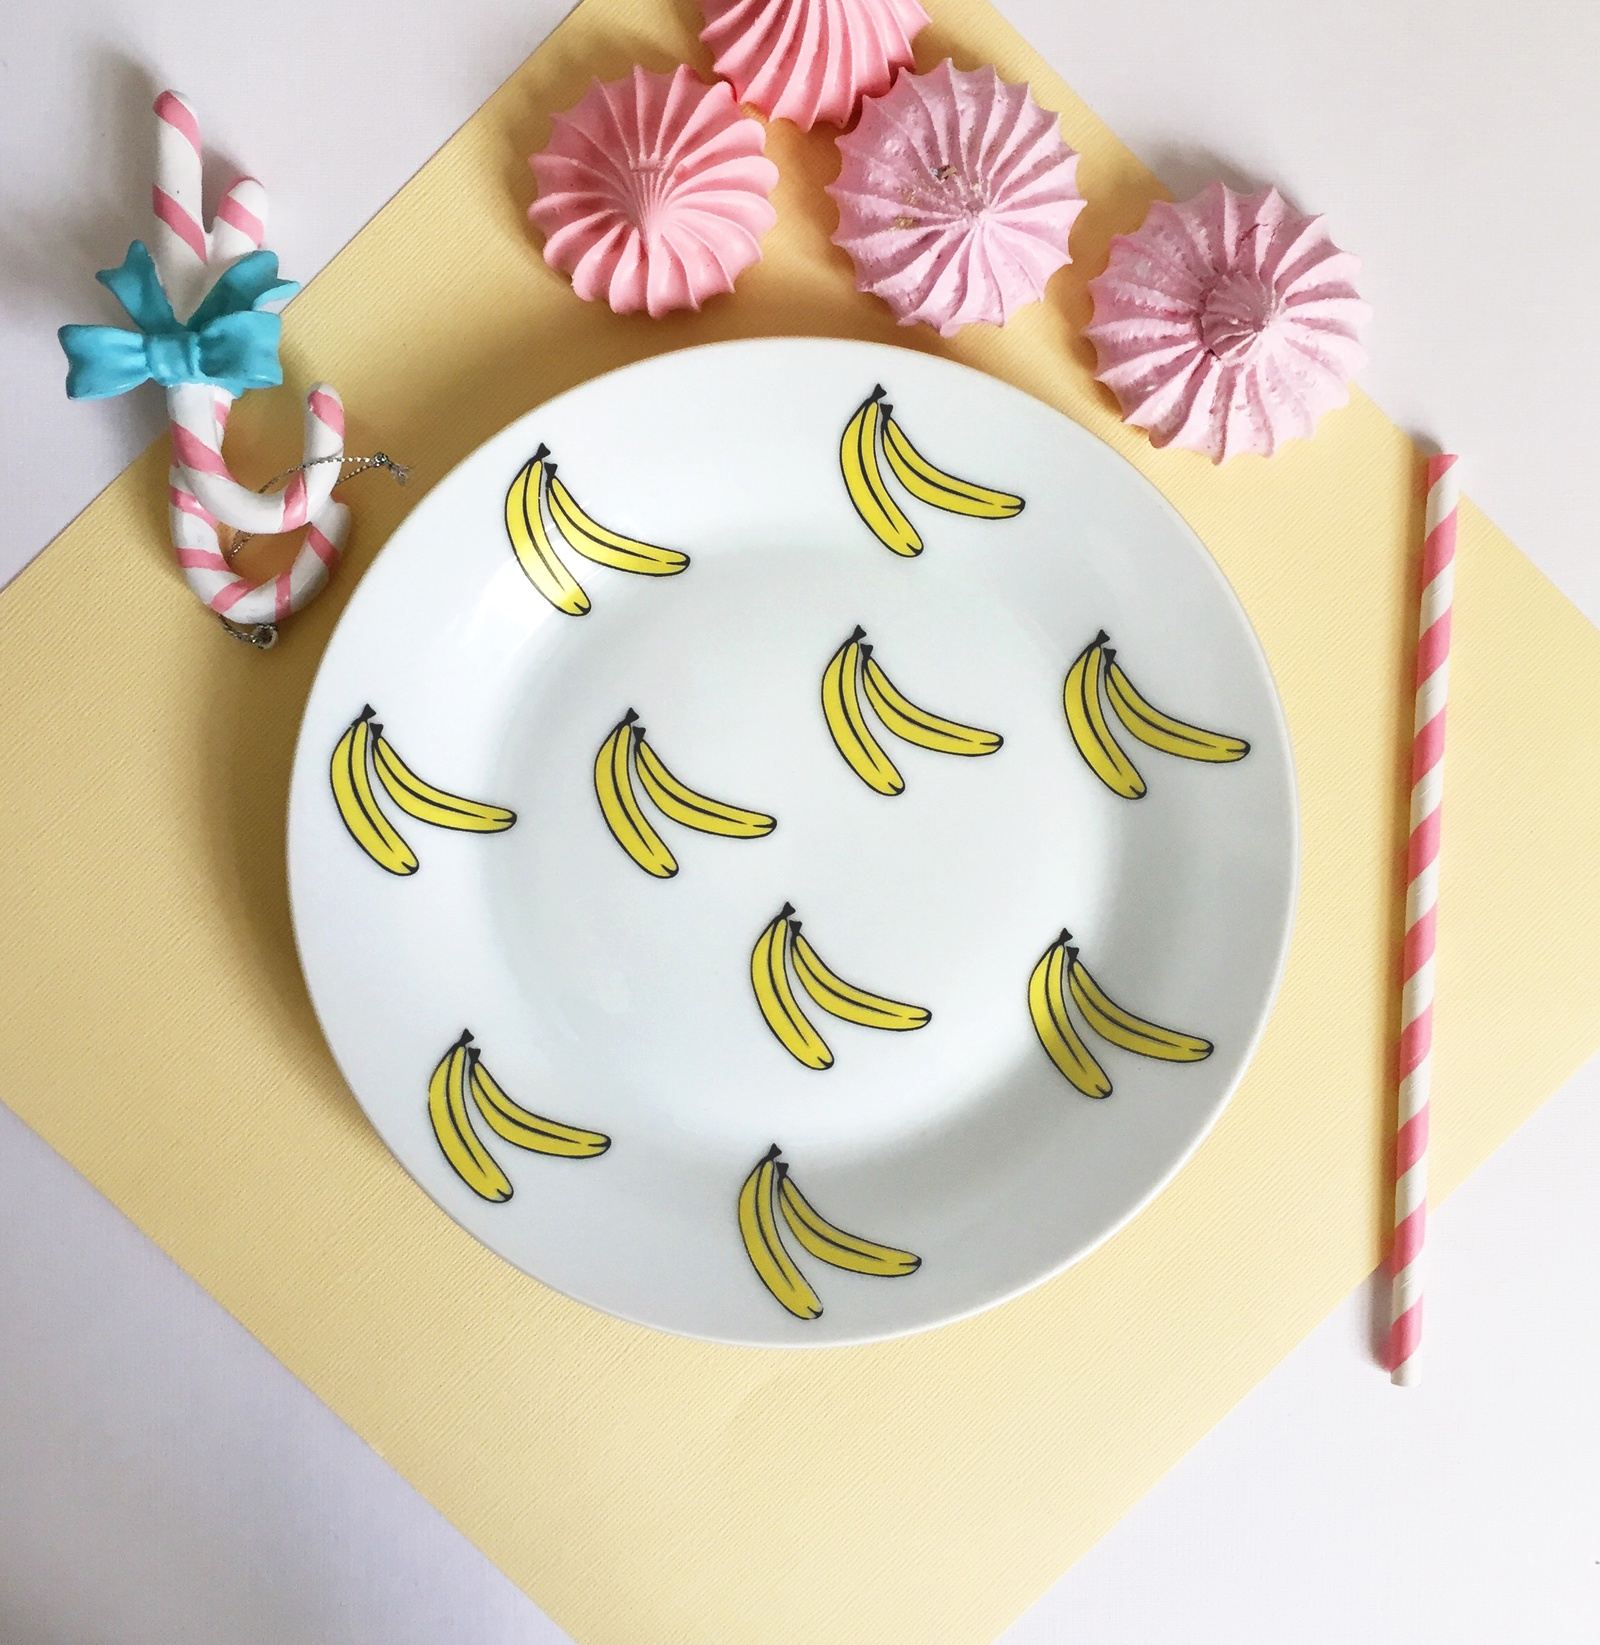 Тарелка Сотвори Чудо Бананы 20 см, белый тарелка сотвори чудо киска диаметр 23 см